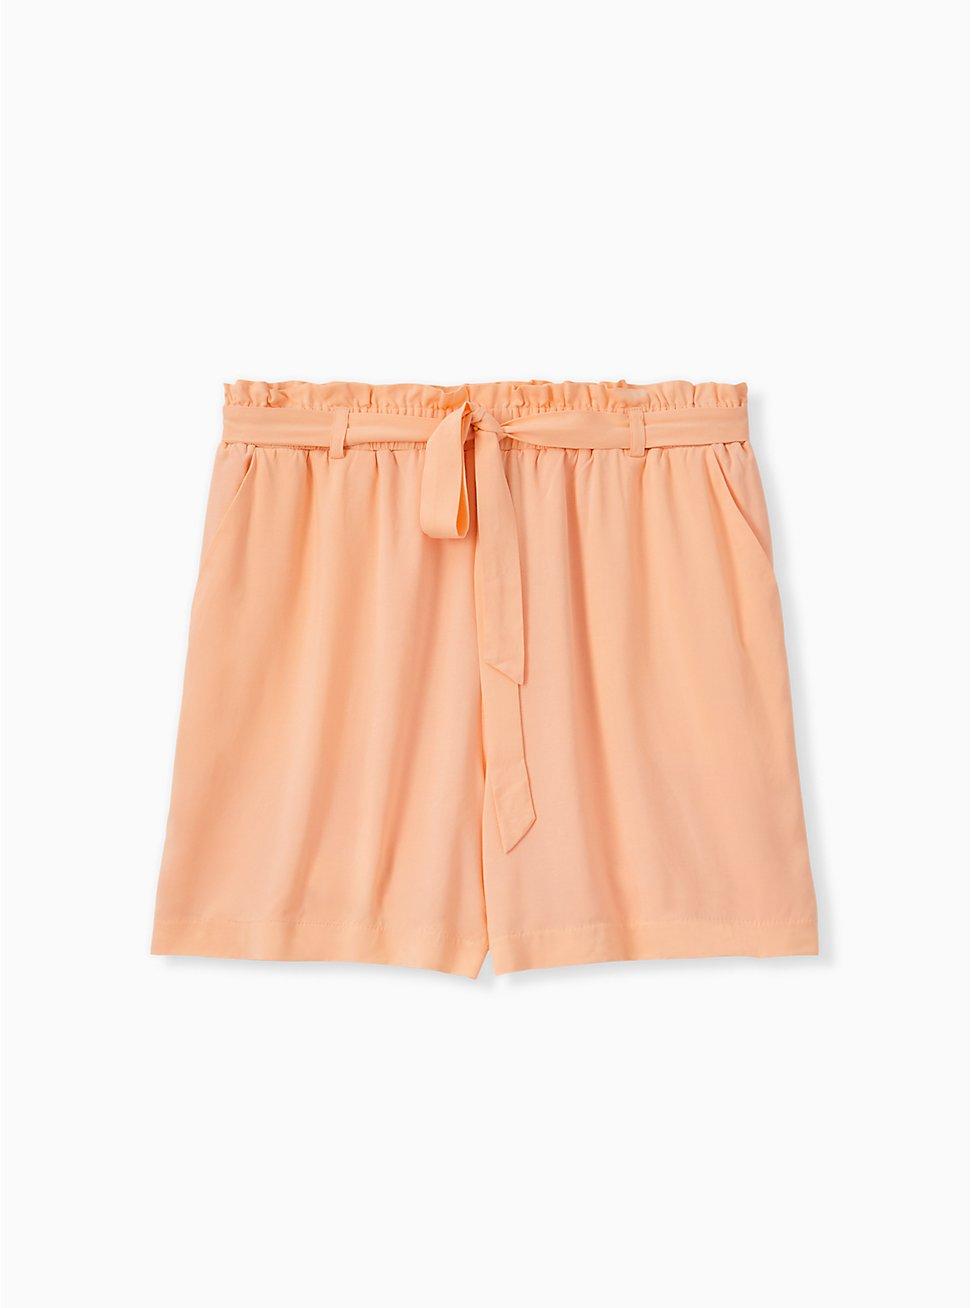 Self Tie Paperbag Waist Mid Short - Challis Peach, PEACH NECTAR, hi-res